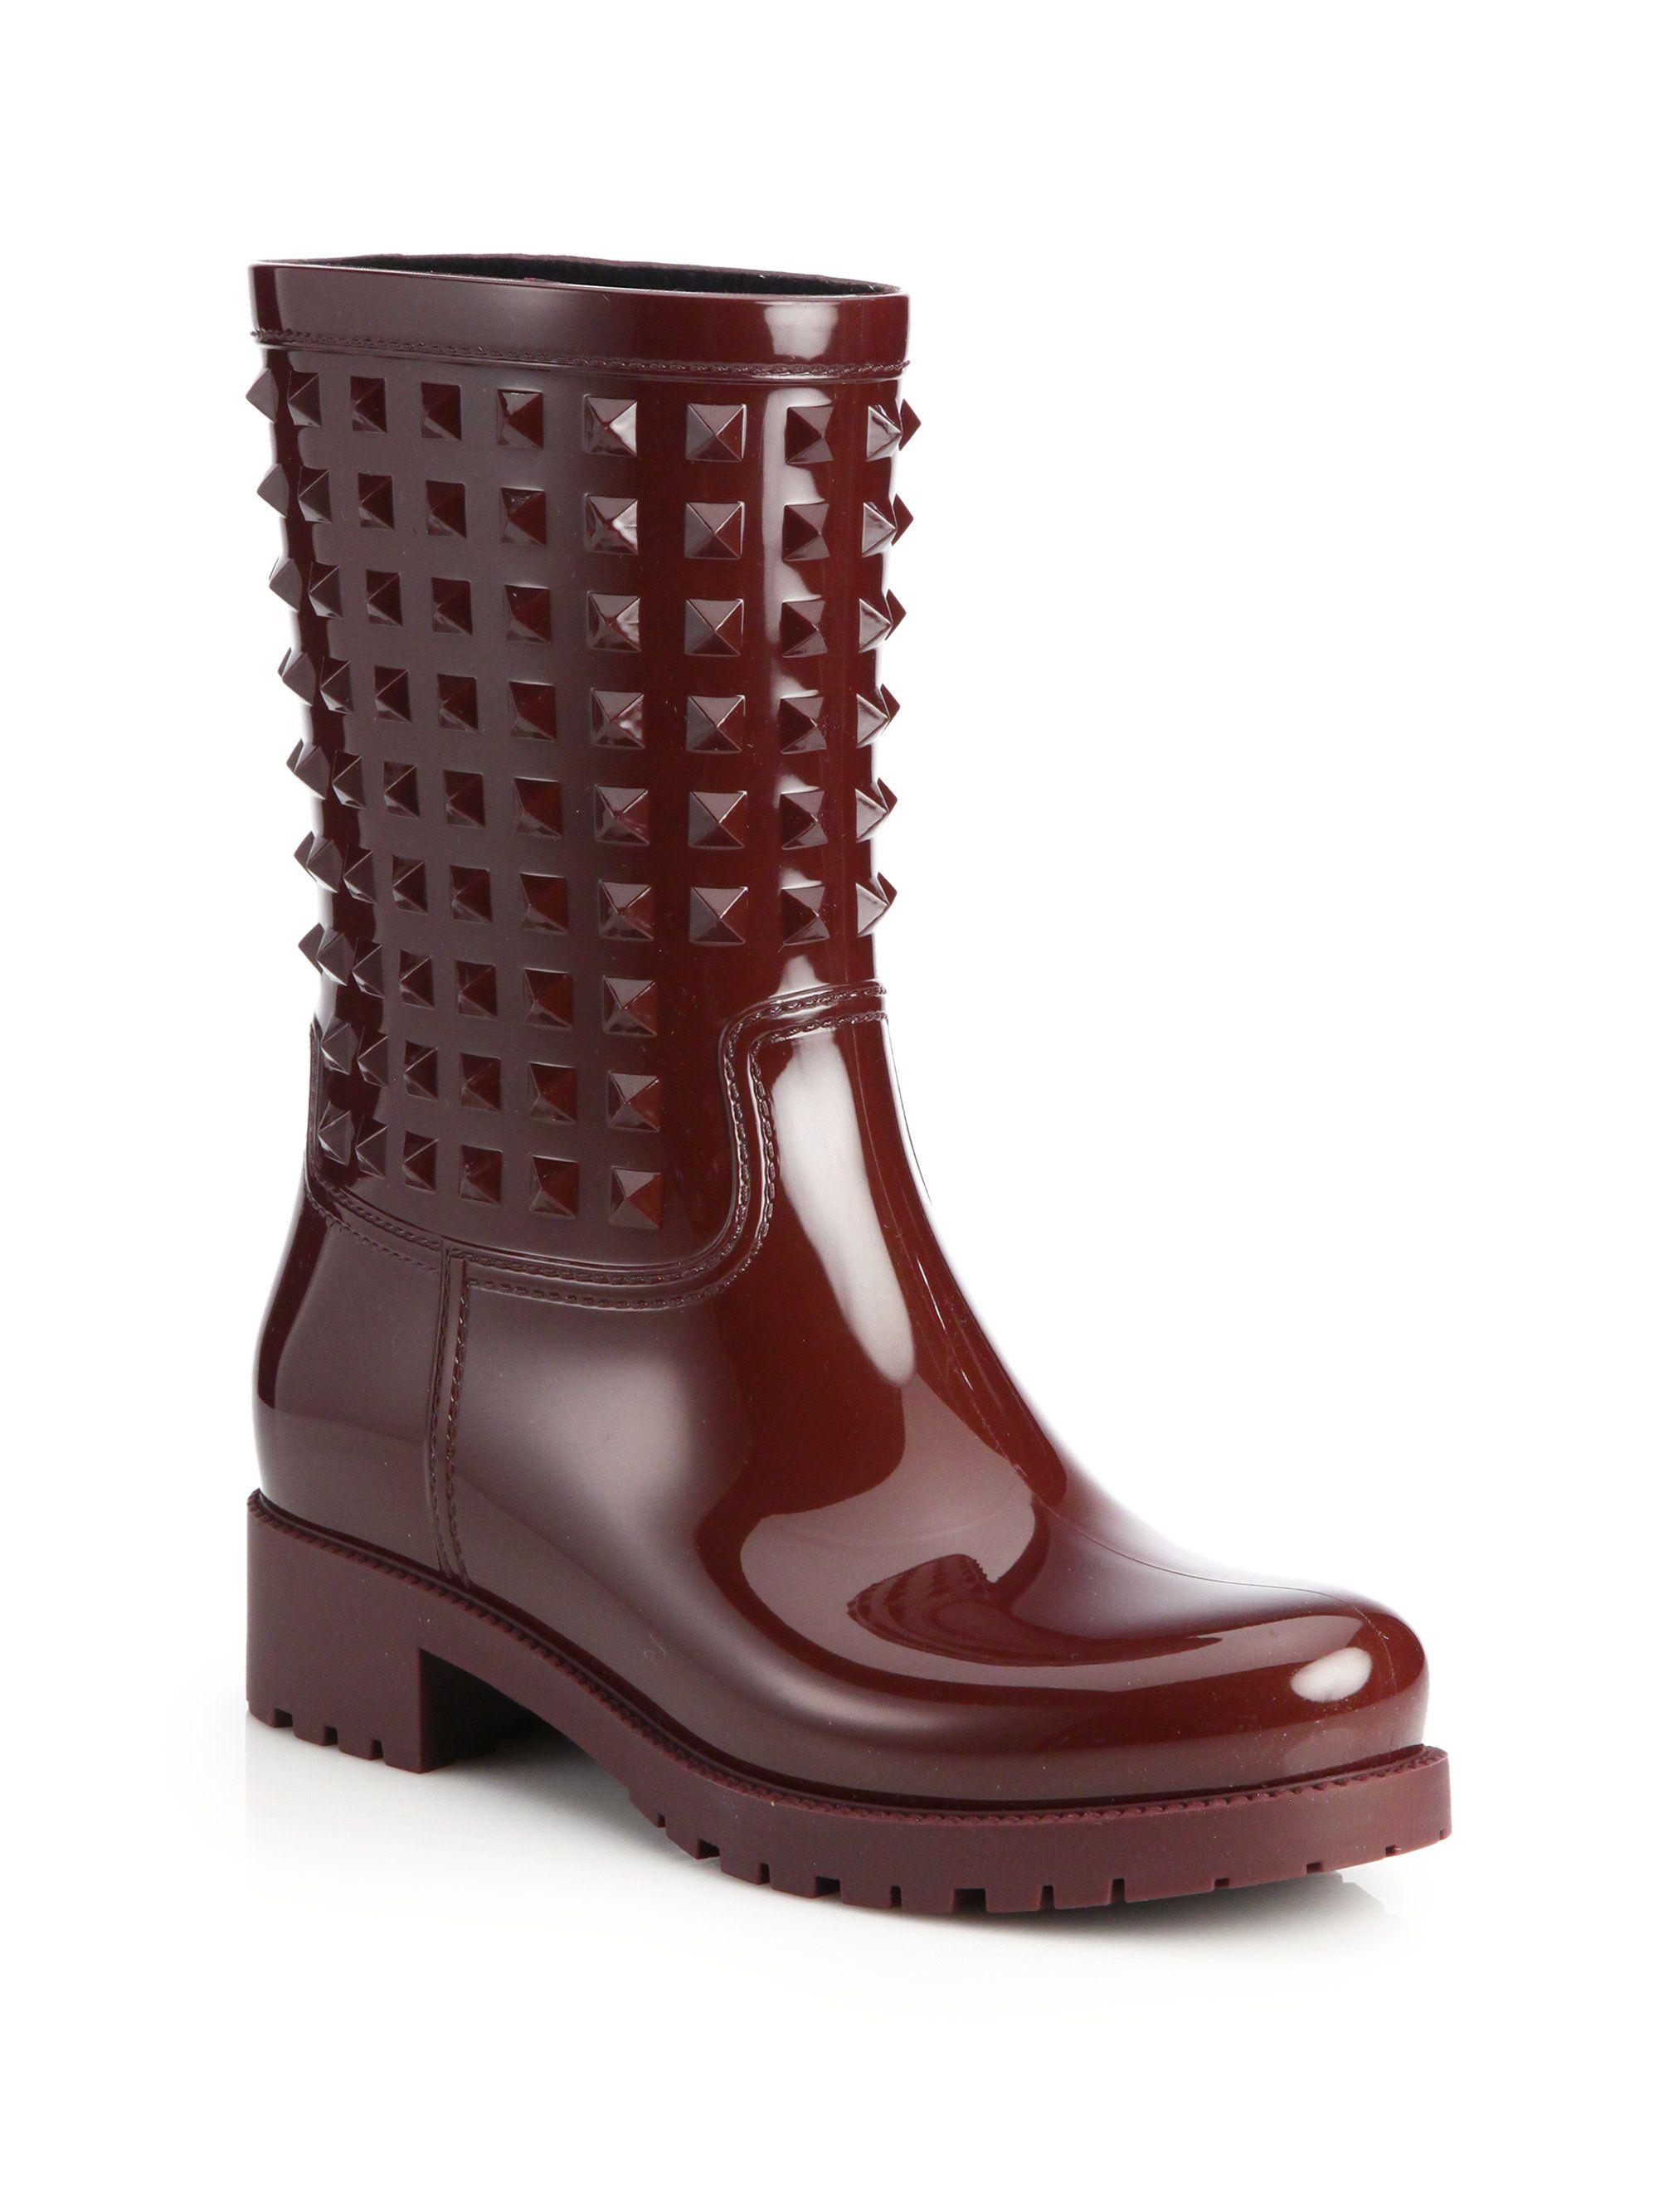 Valentino Rockstud Rain Ankle Boots perfect cheap price 3m1ZLX